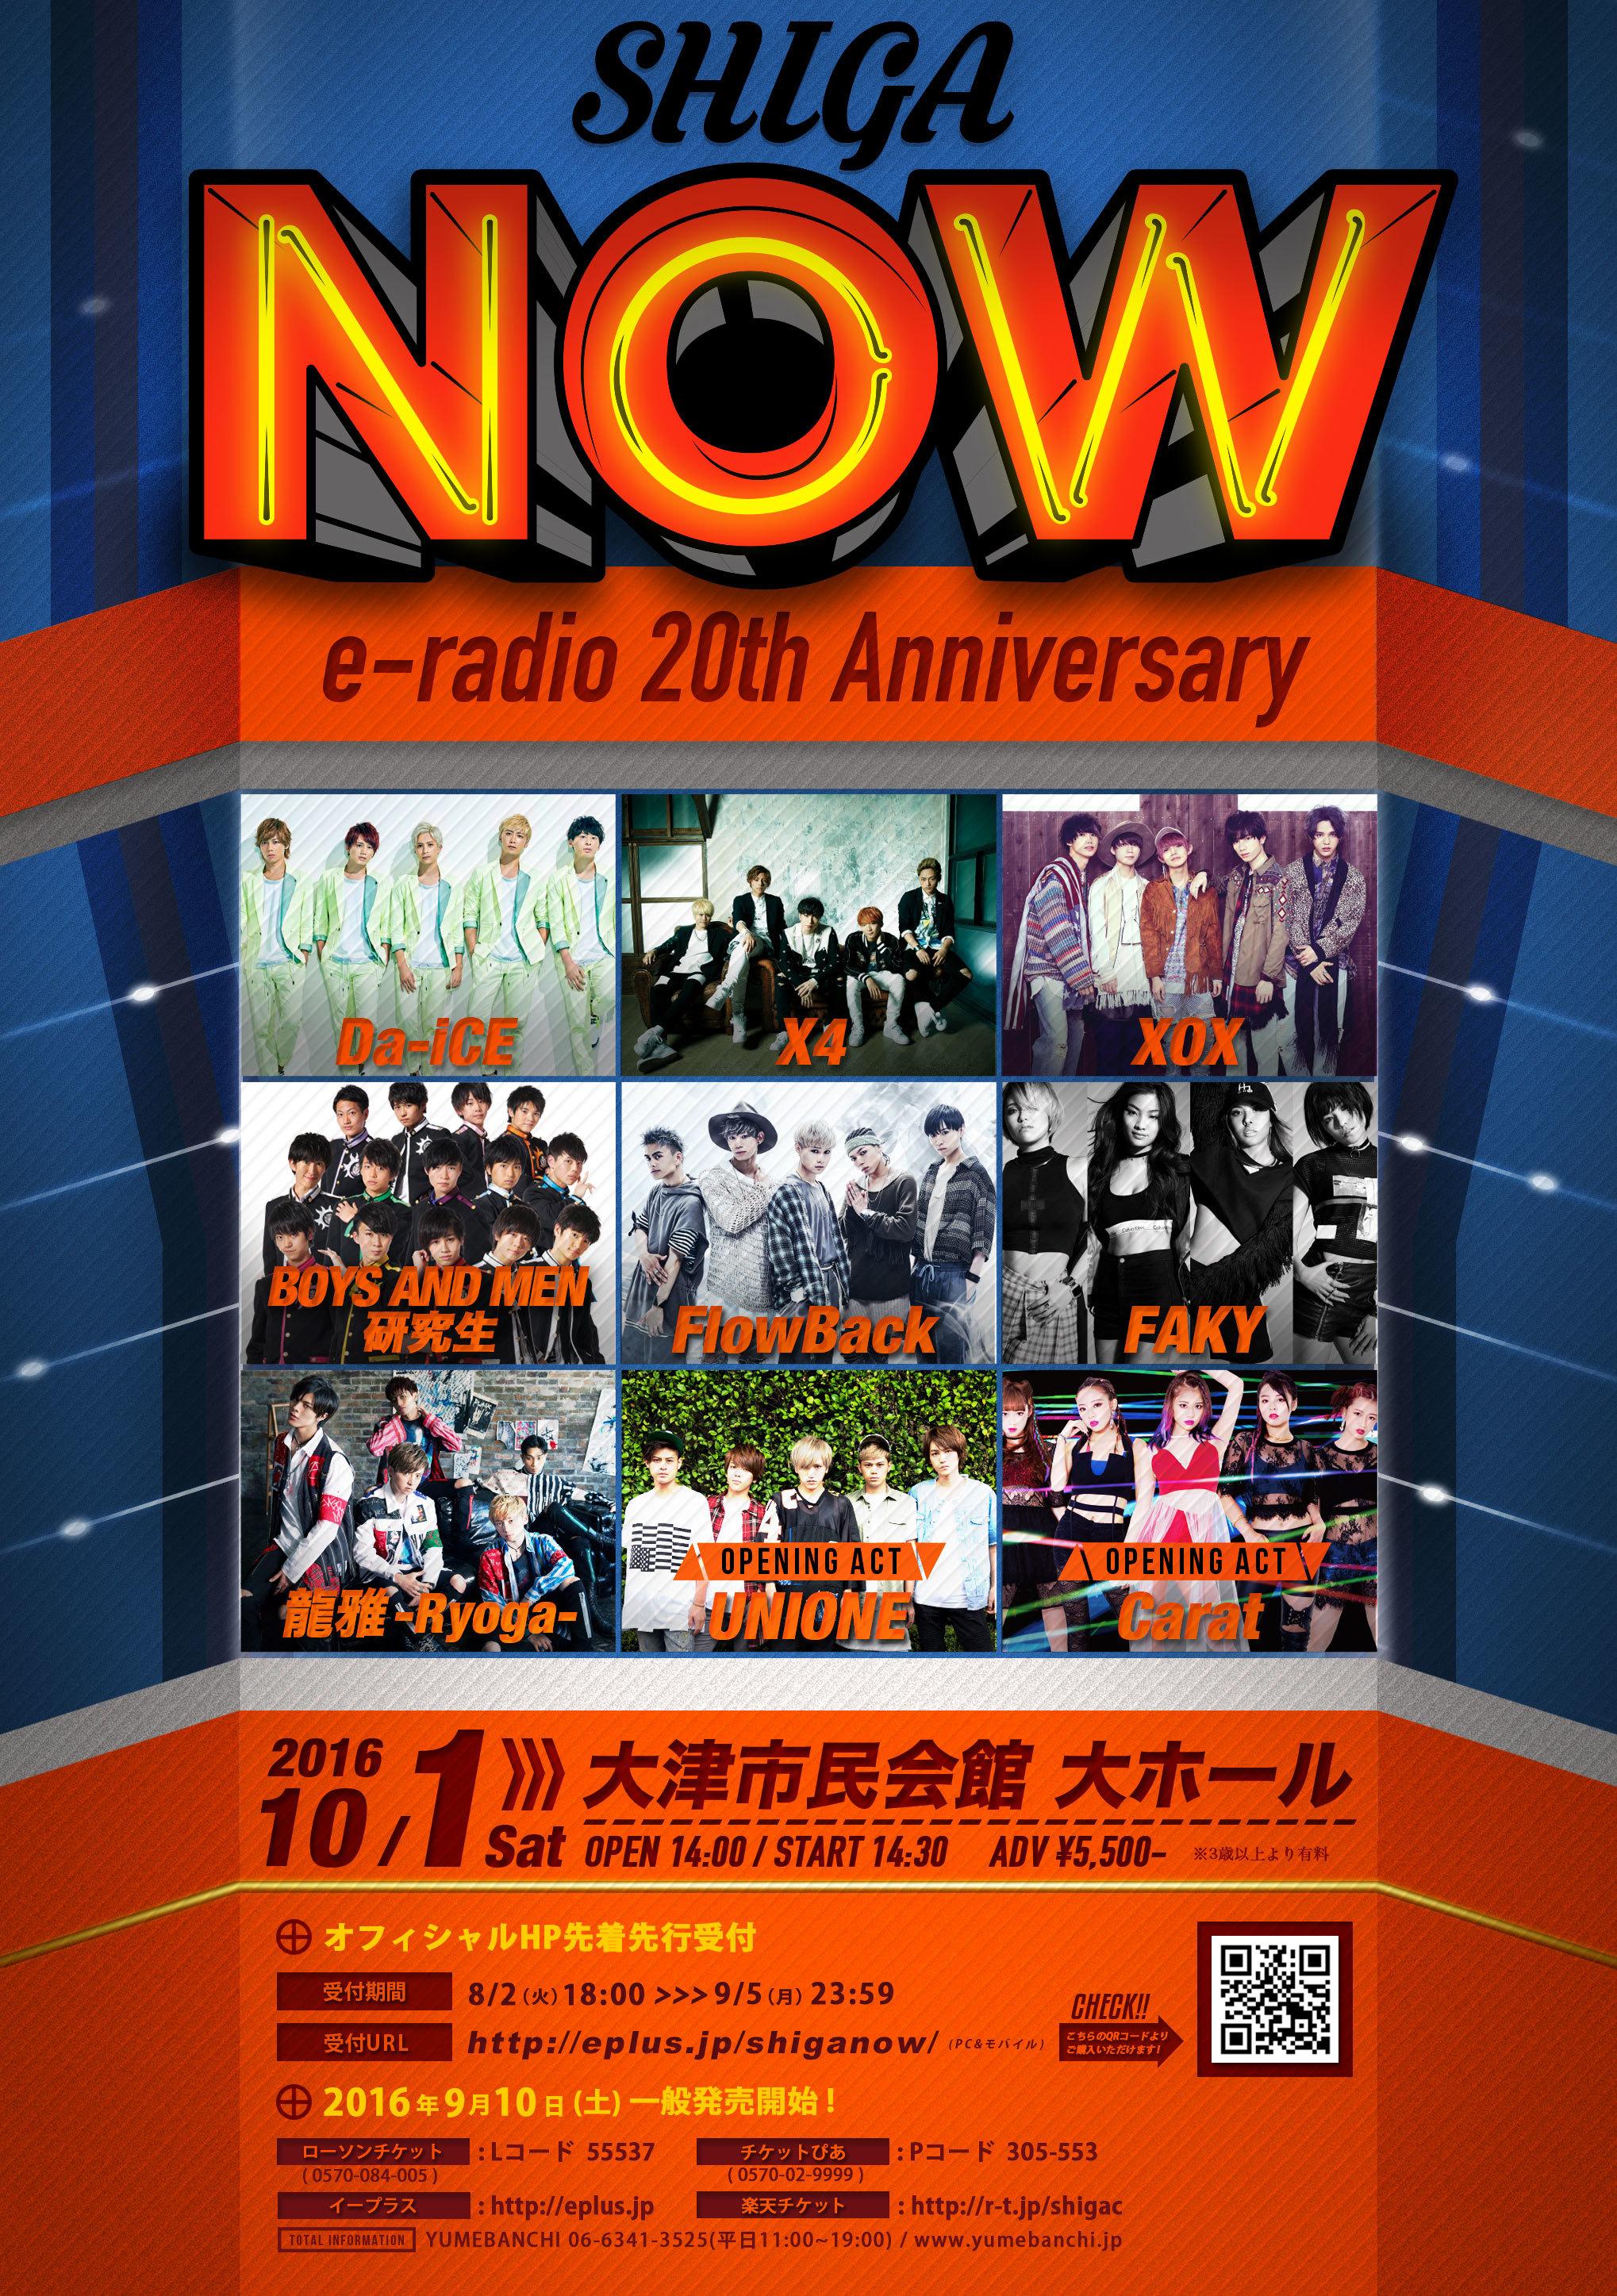 『e-radio 20th Anniversary SHIGA NOW』